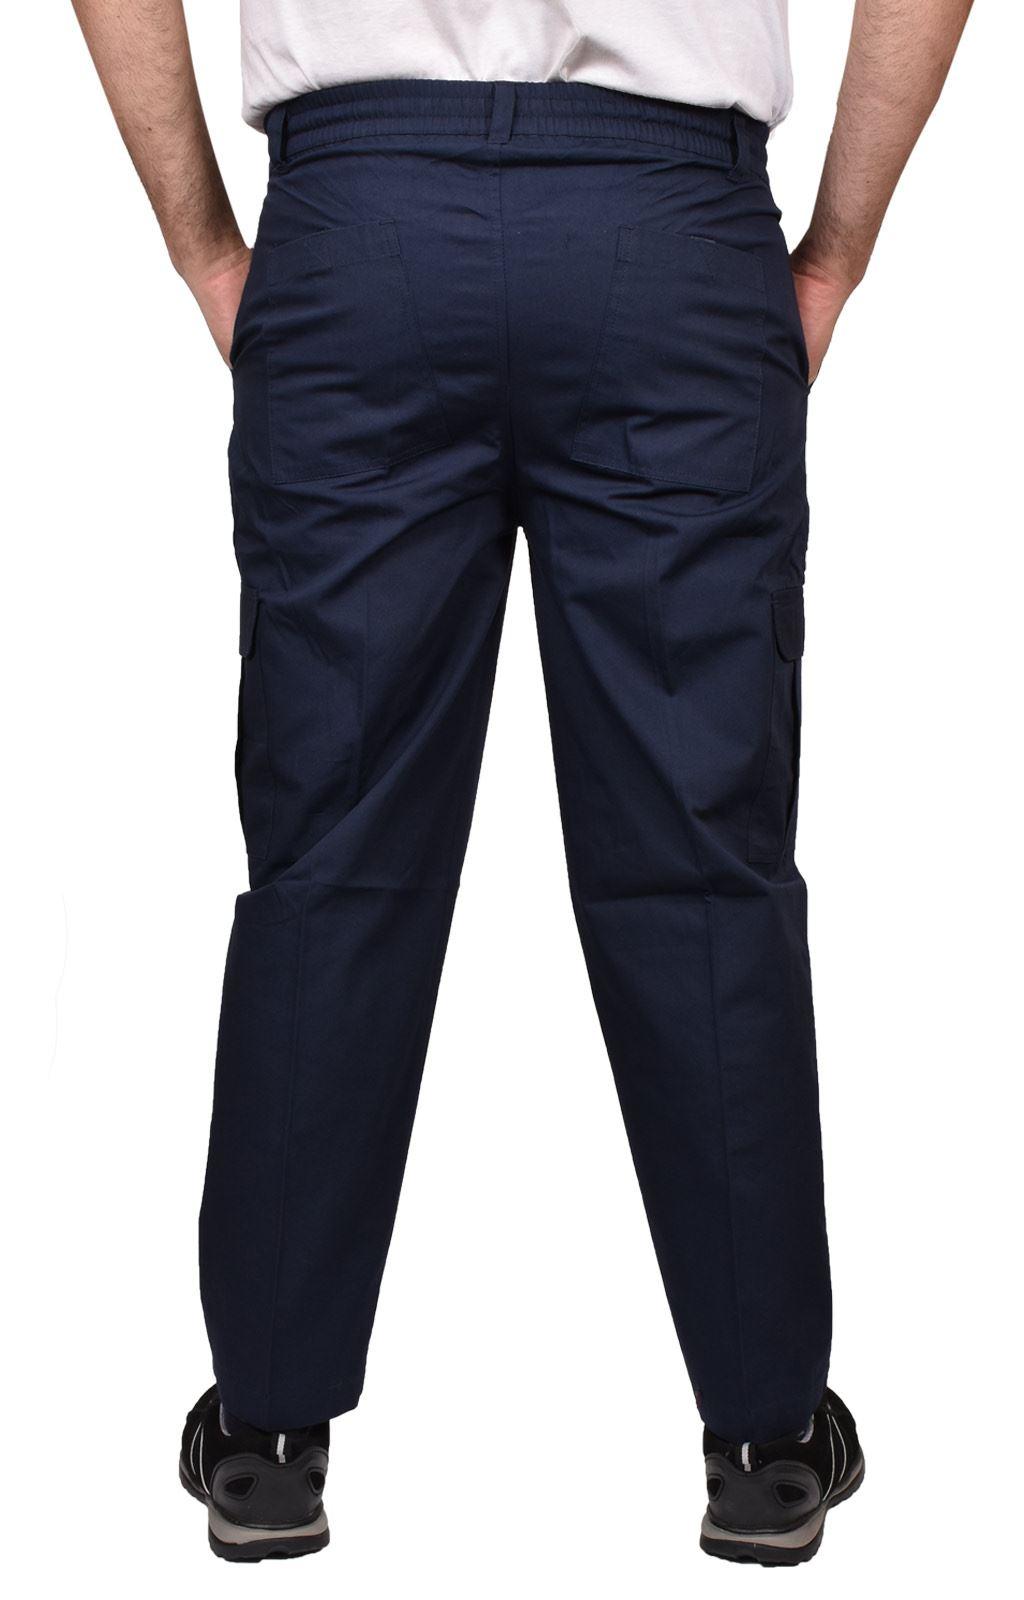 Para-Hombre-De-Carga-Combate-Pantalones-De-Trabajo-Bolsillos-Patrulla-Tactico-Pro-Algodon-Pantalones miniatura 12